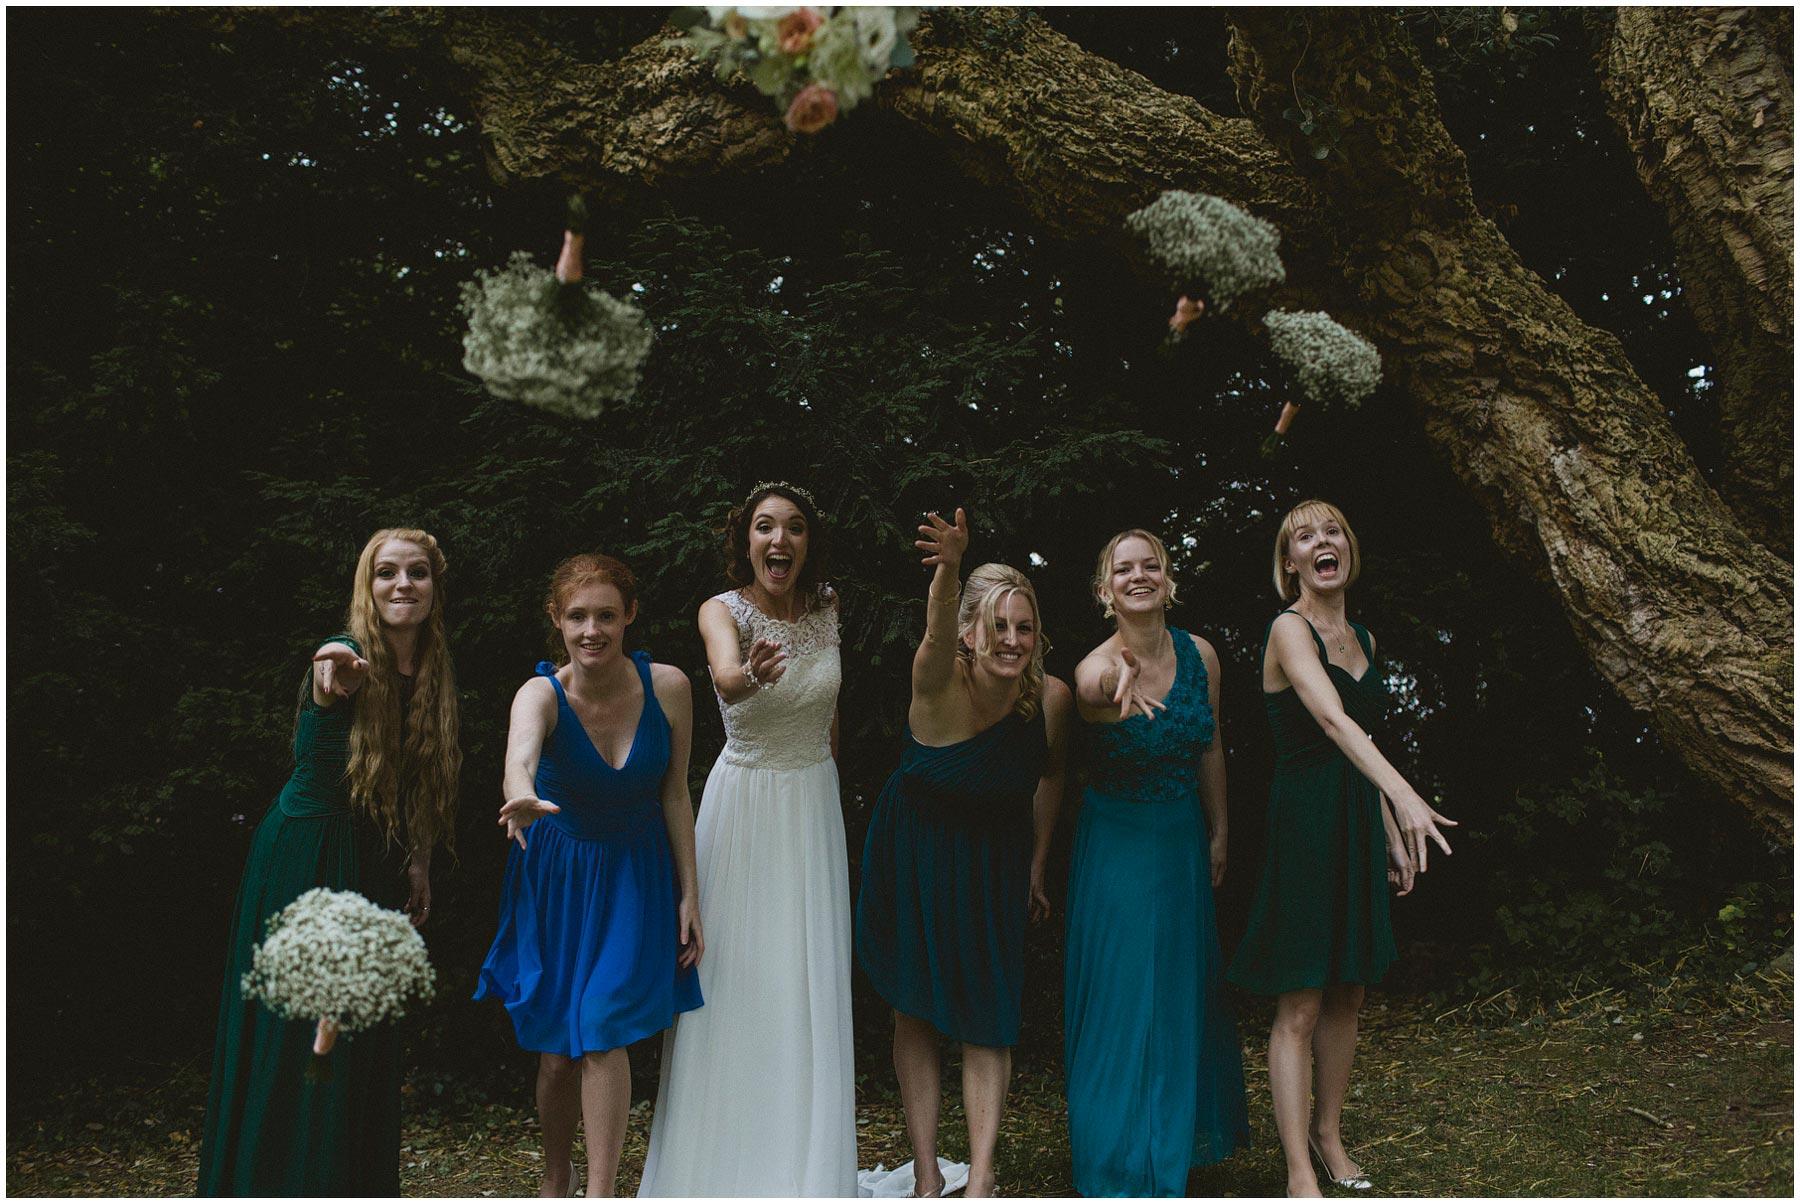 Colehayes-Park-Wedding-Photography_0151